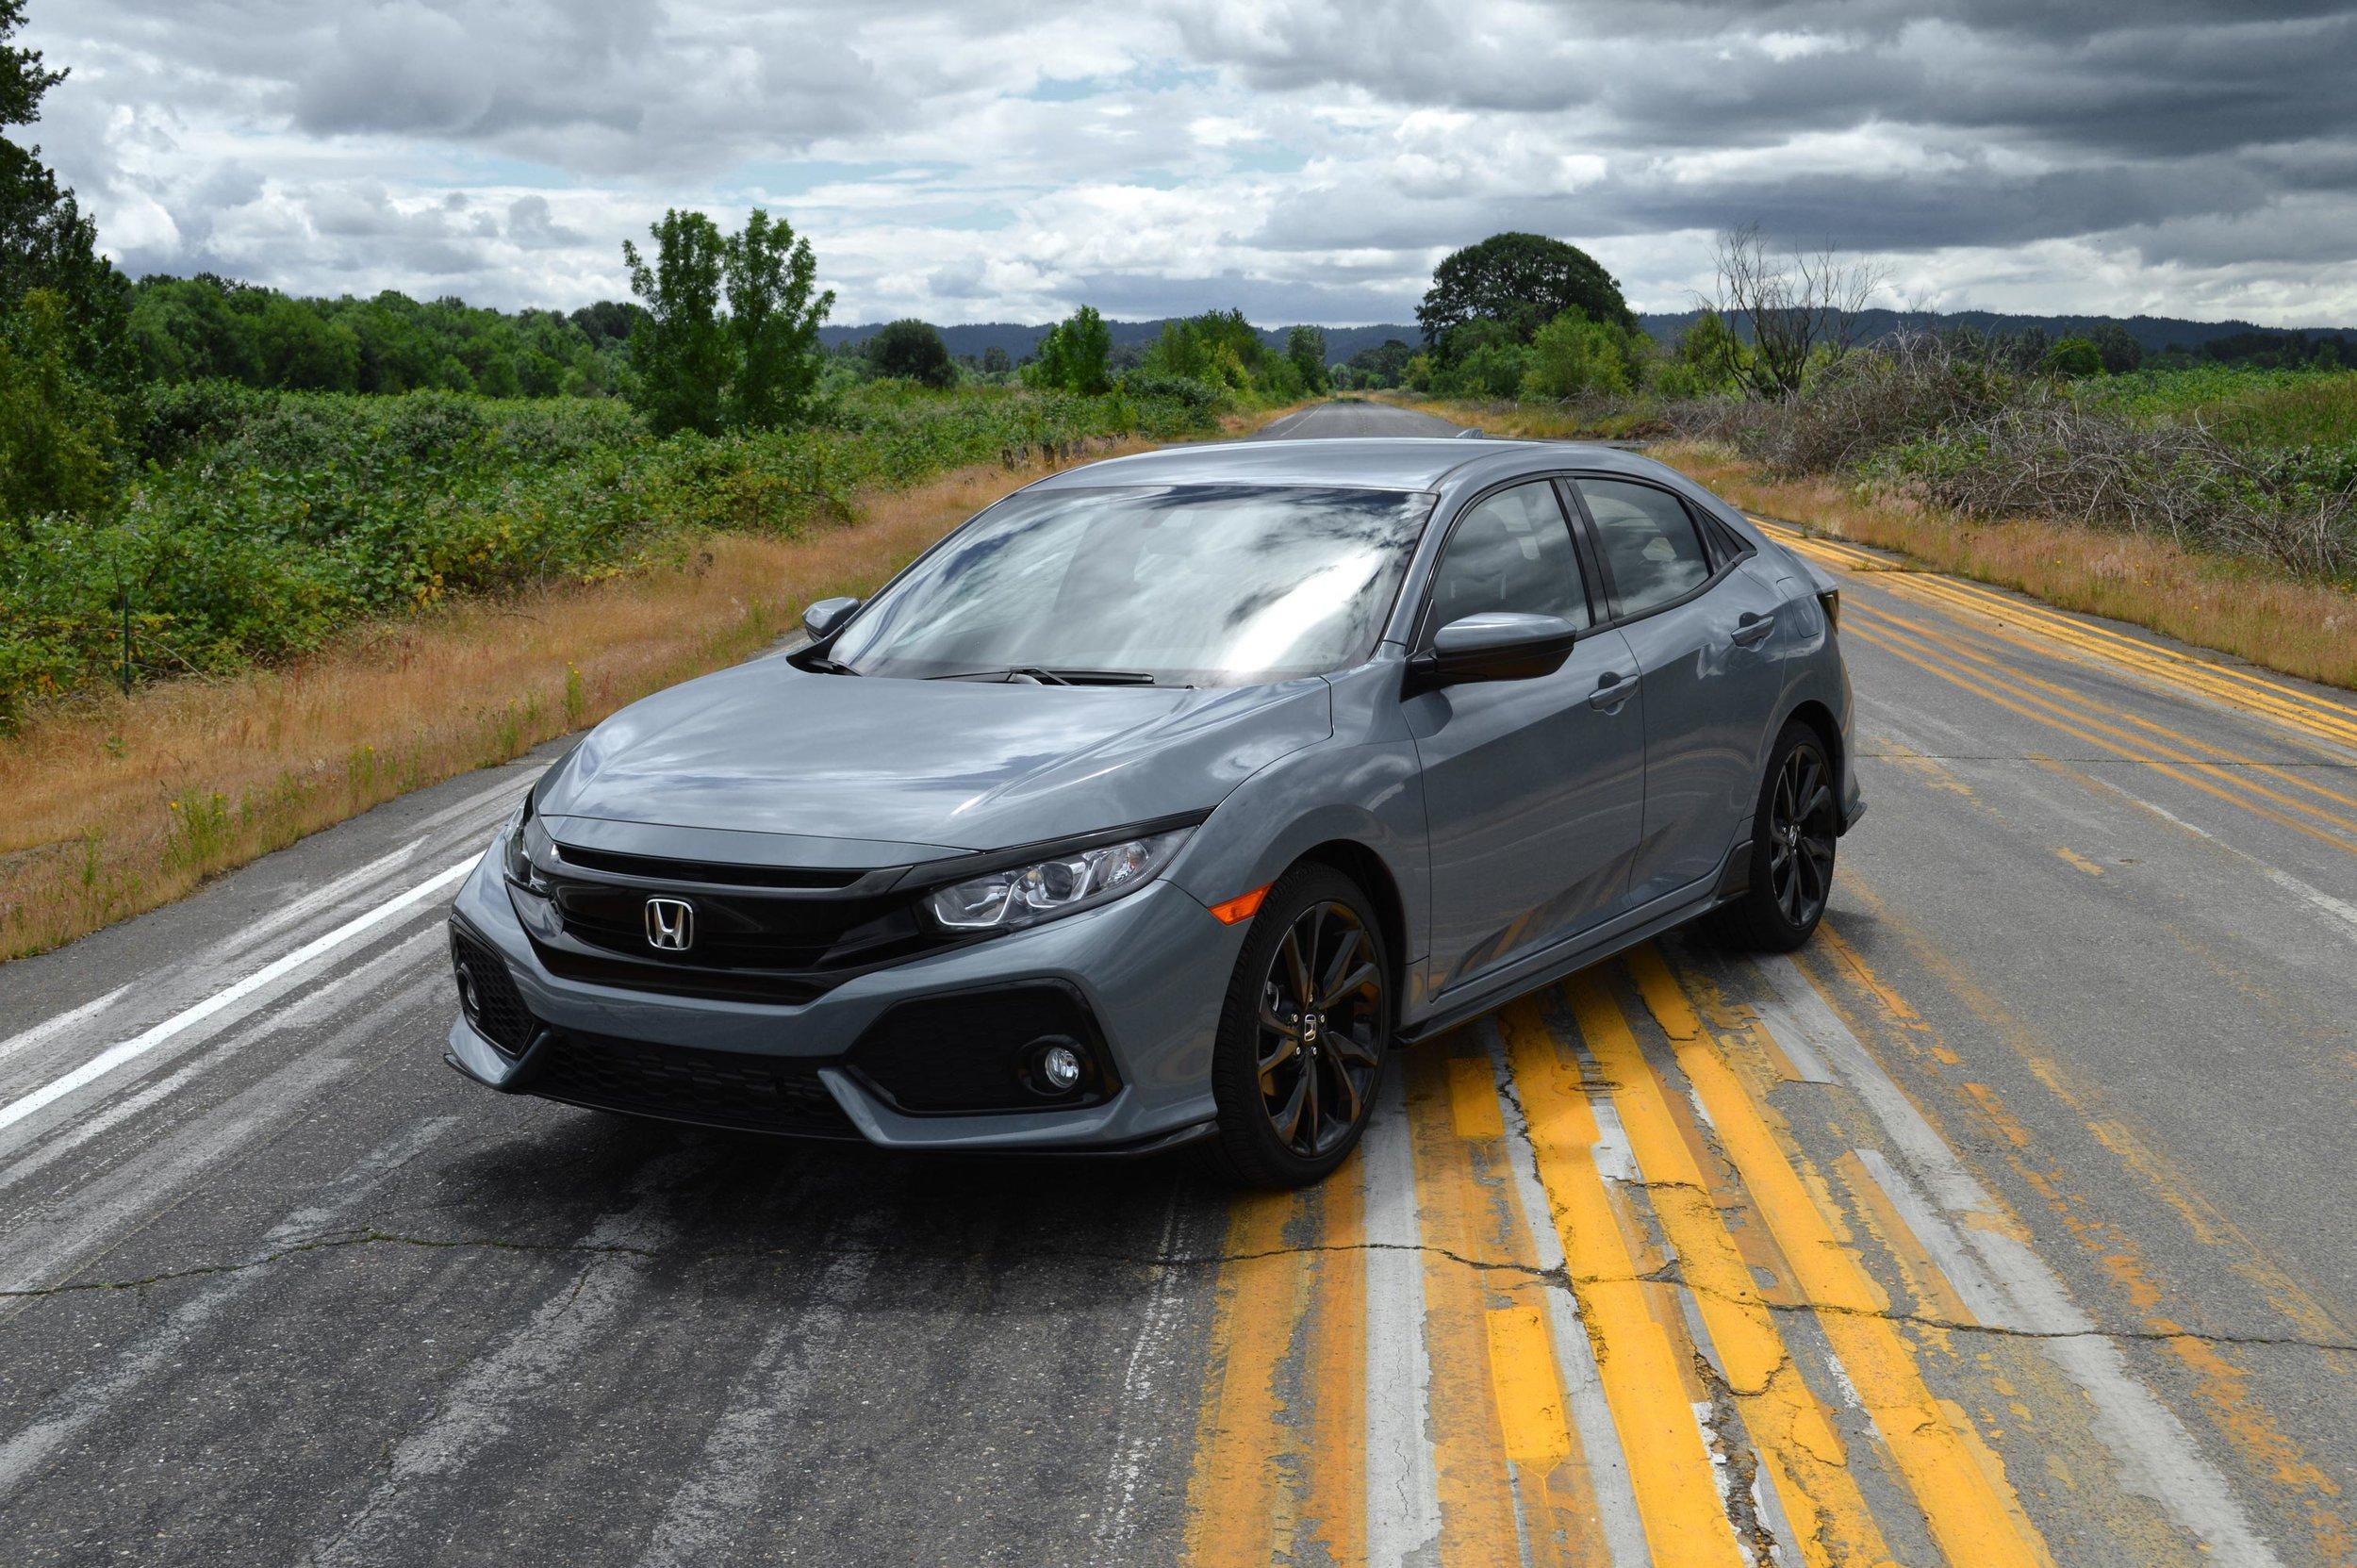 2017-Honda-HSB-Exterior-2-web.jpg